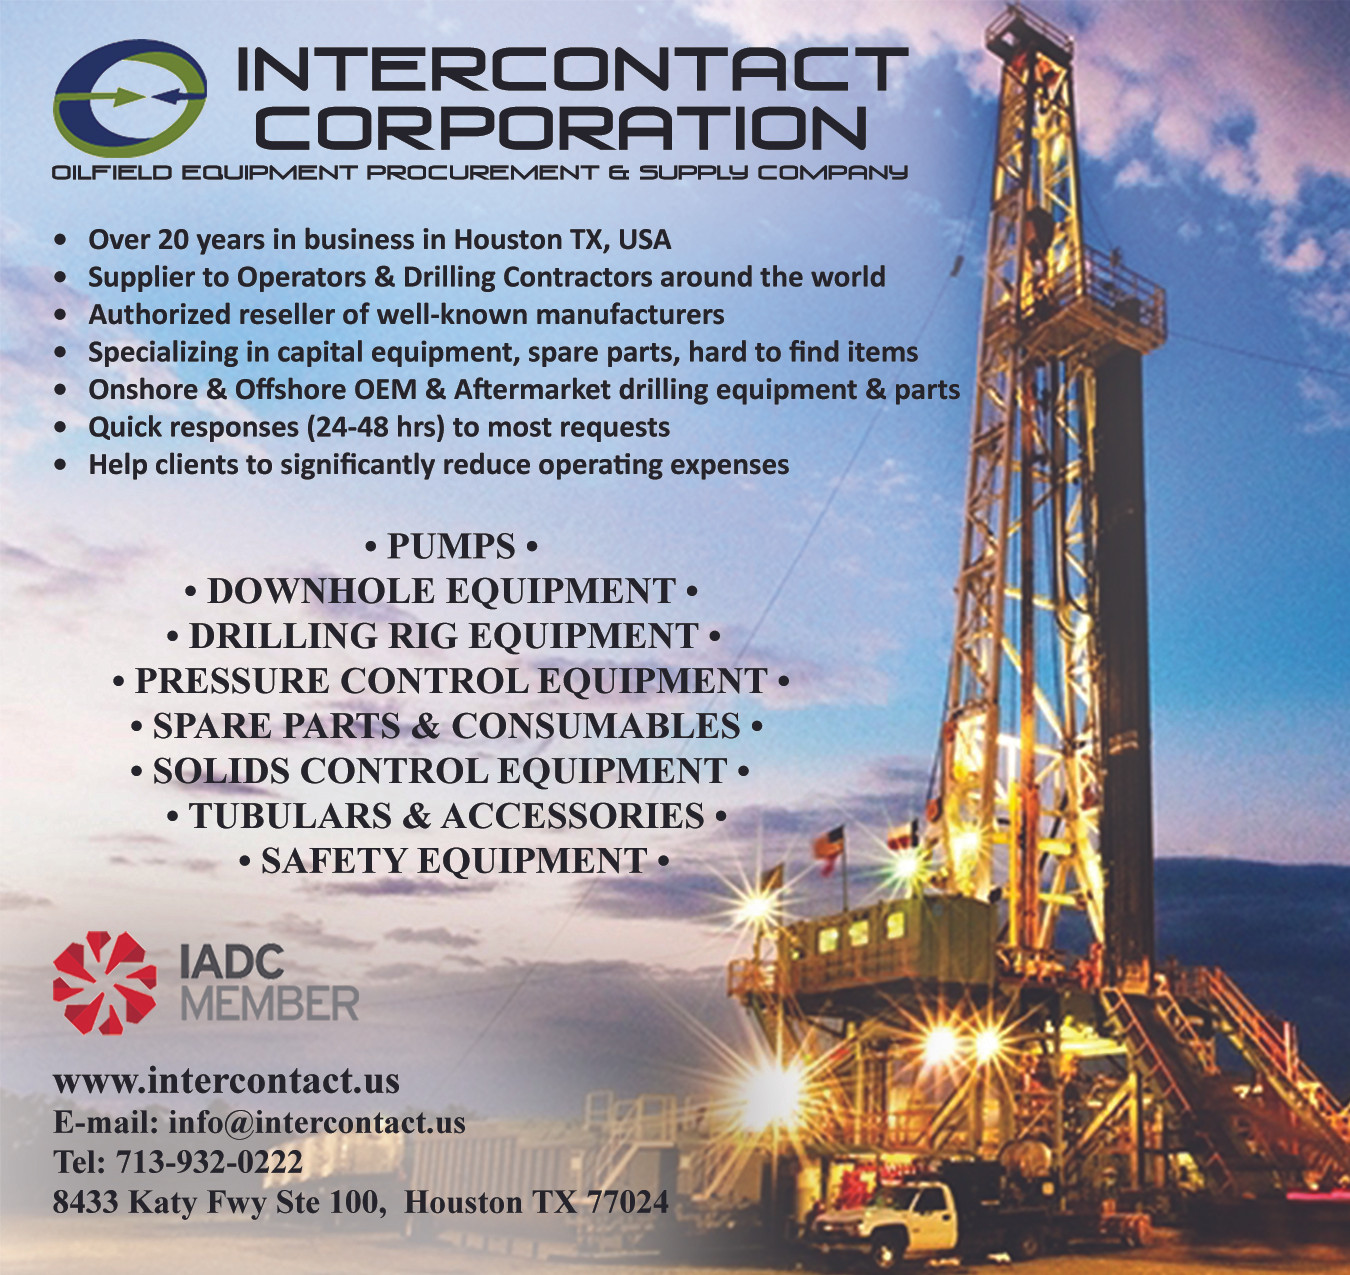 Intercontact Corporation